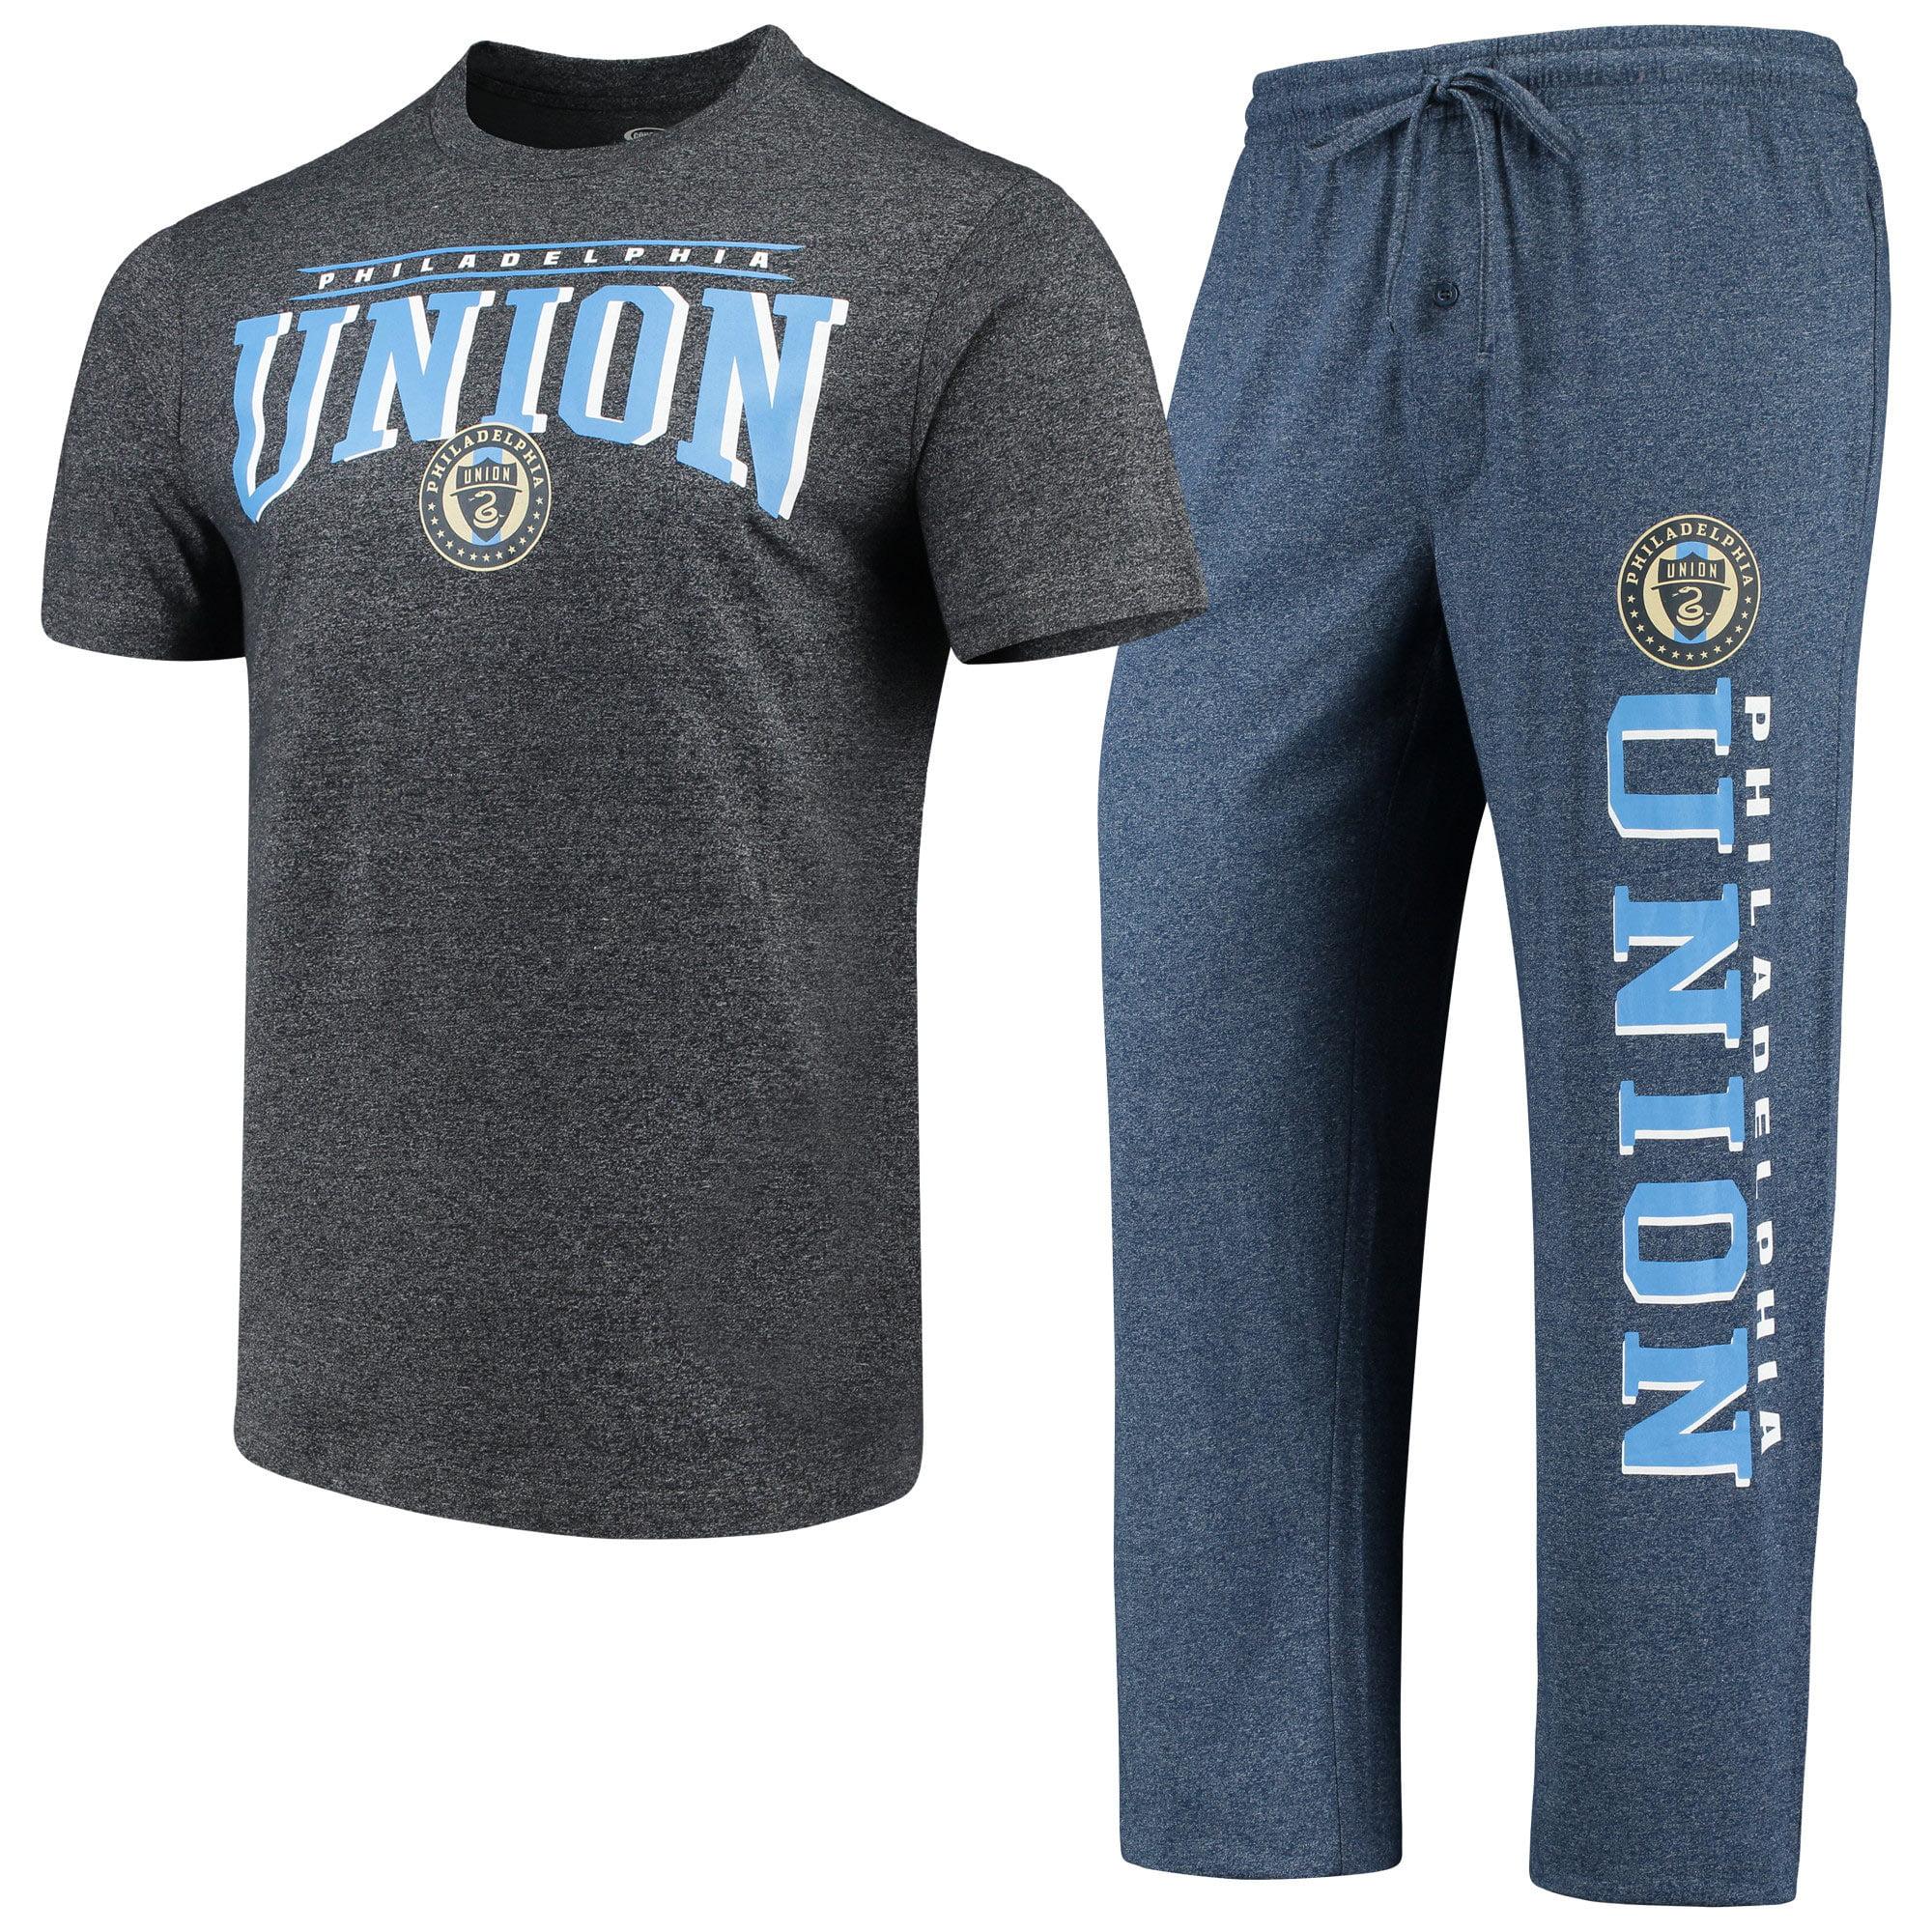 Philadelphia Union Concepts Sport Spar Pants & Top Sleep Set - Navy/Charcoal